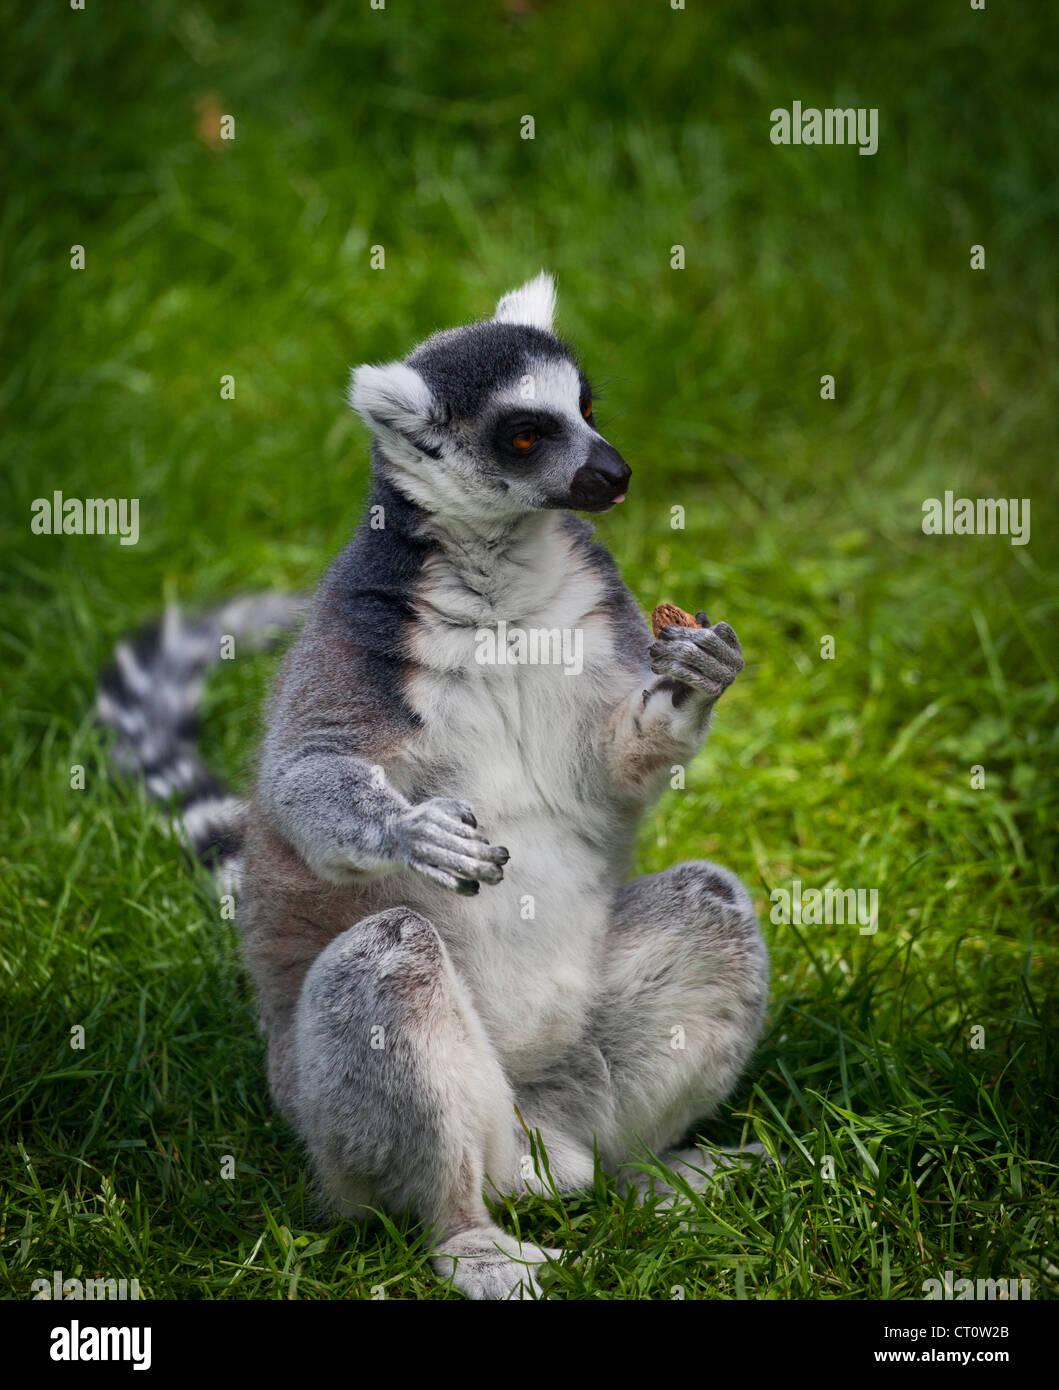 Ring tailed lemur at Paradise Wildlife Park, Broxbourne Stock Photo